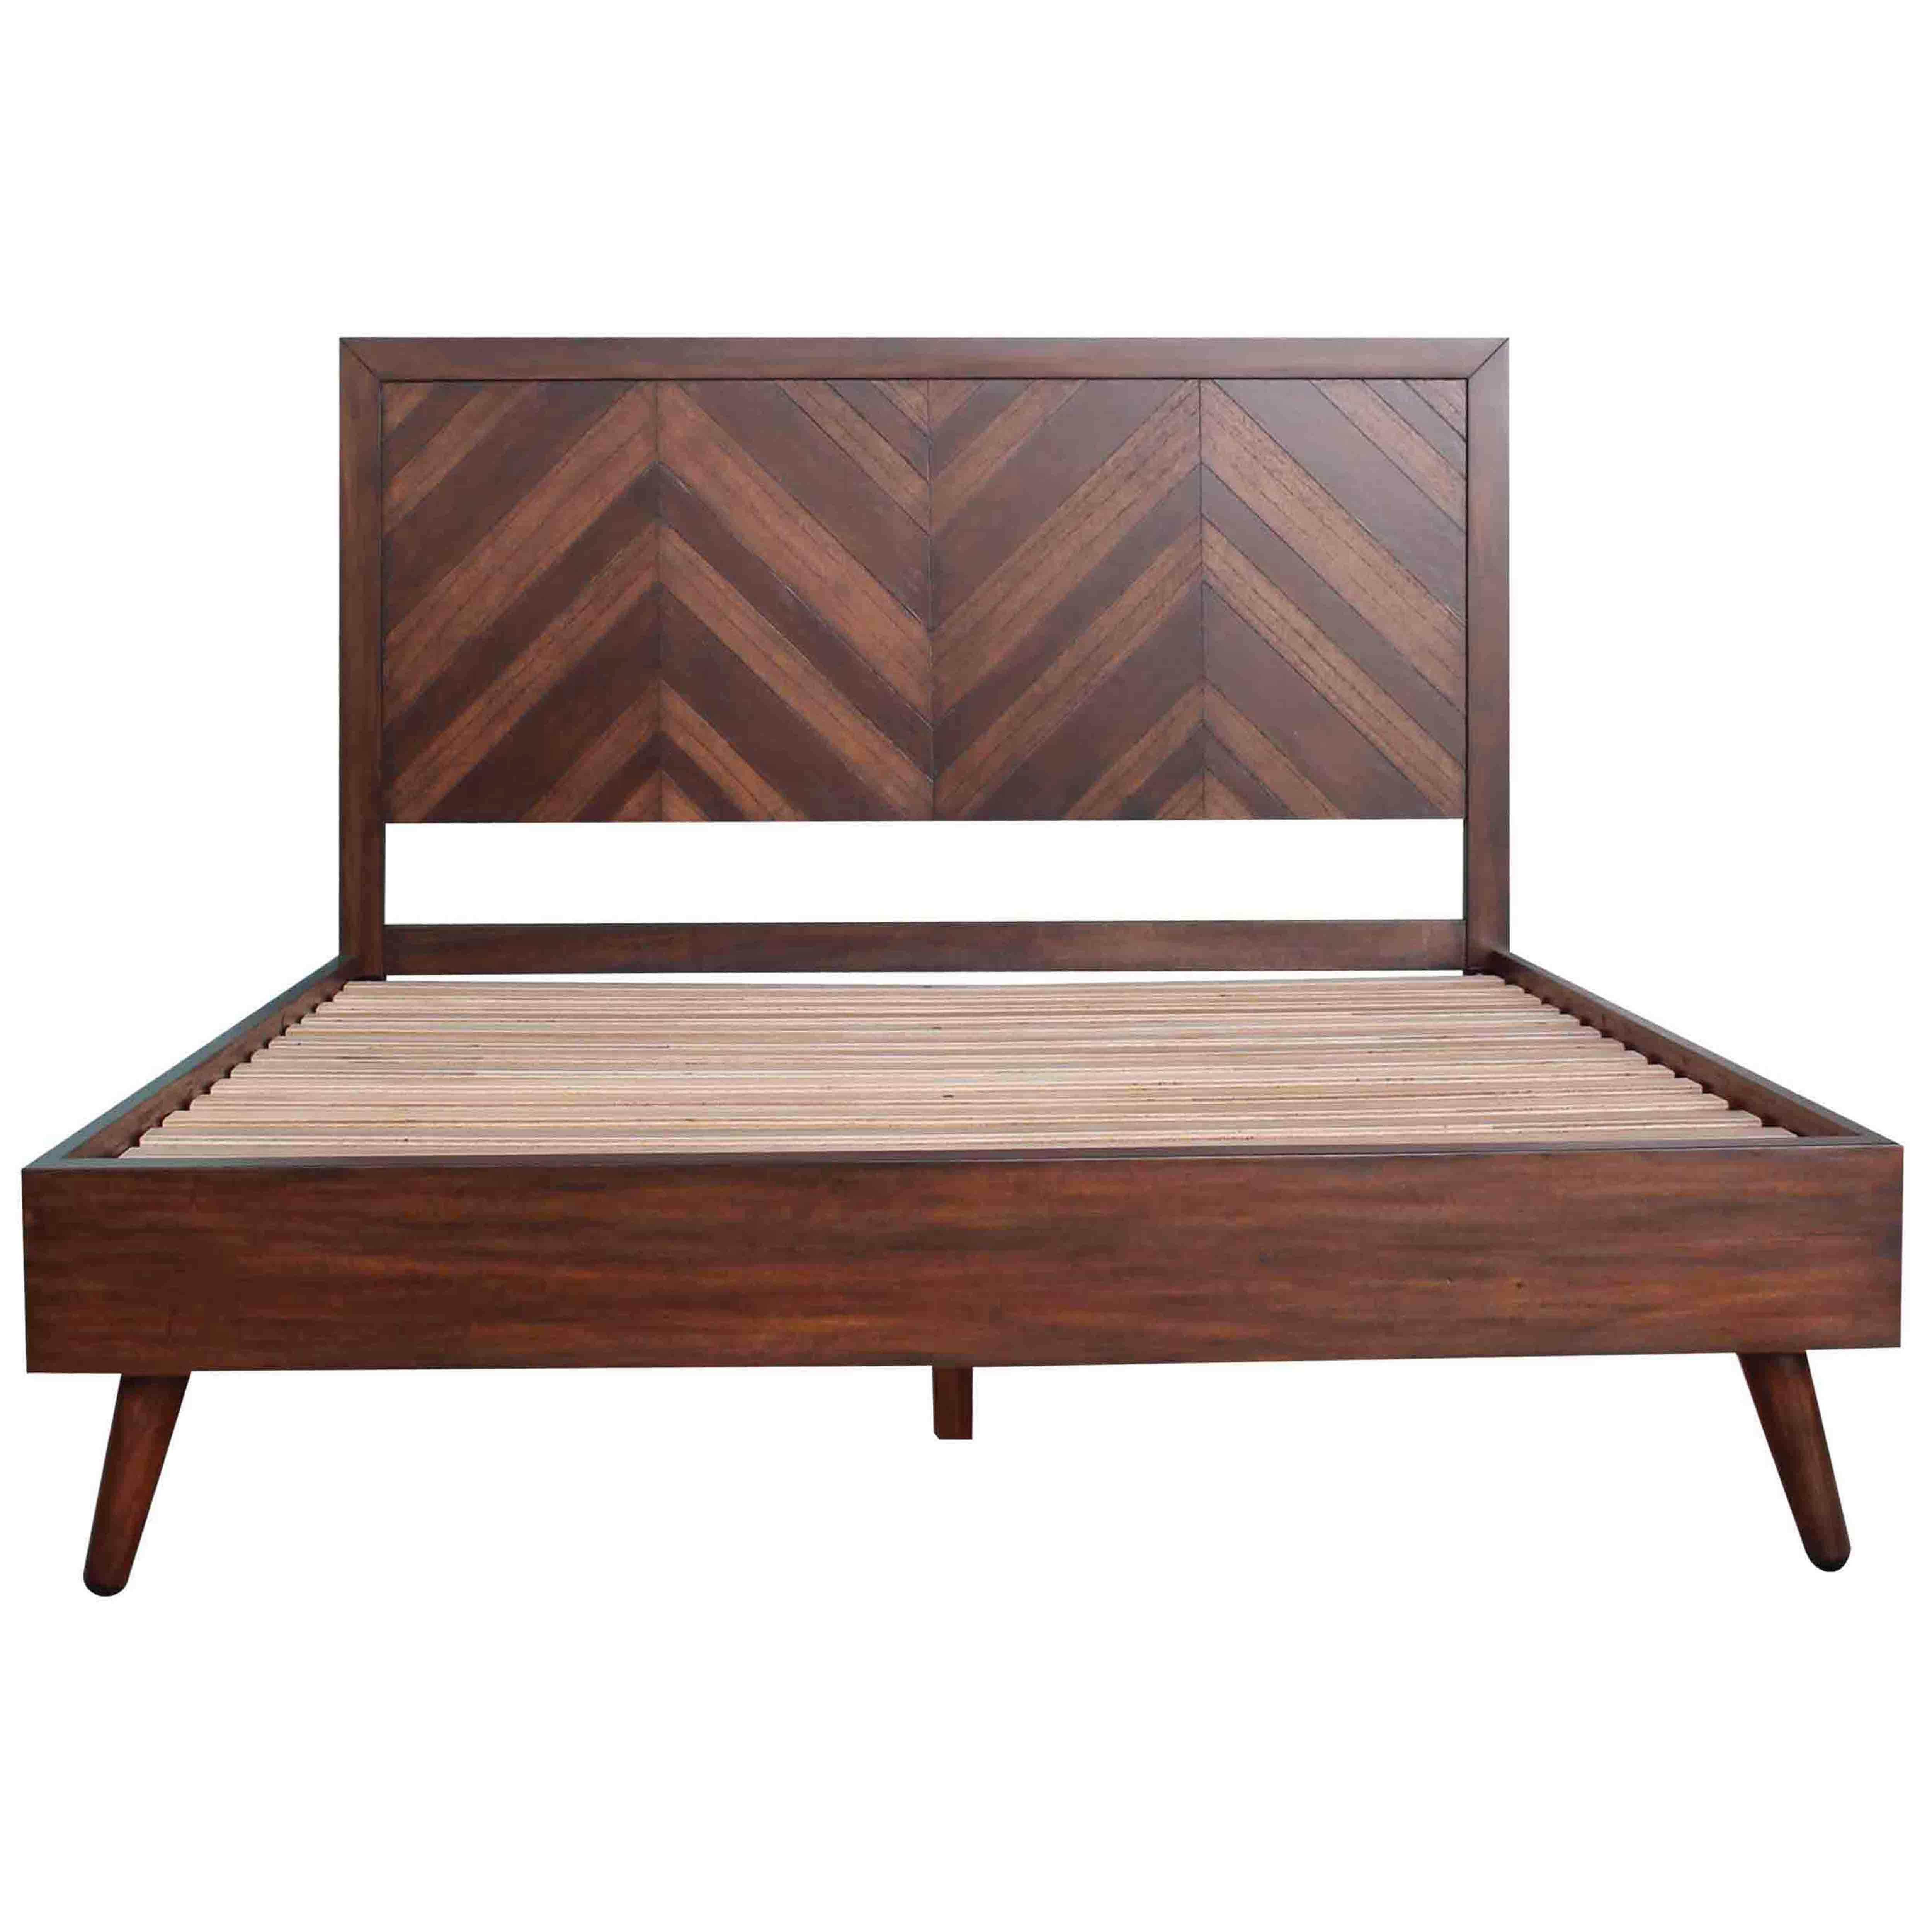 7800012 Jv Npd Home Furniture Wholesale Lifestyle